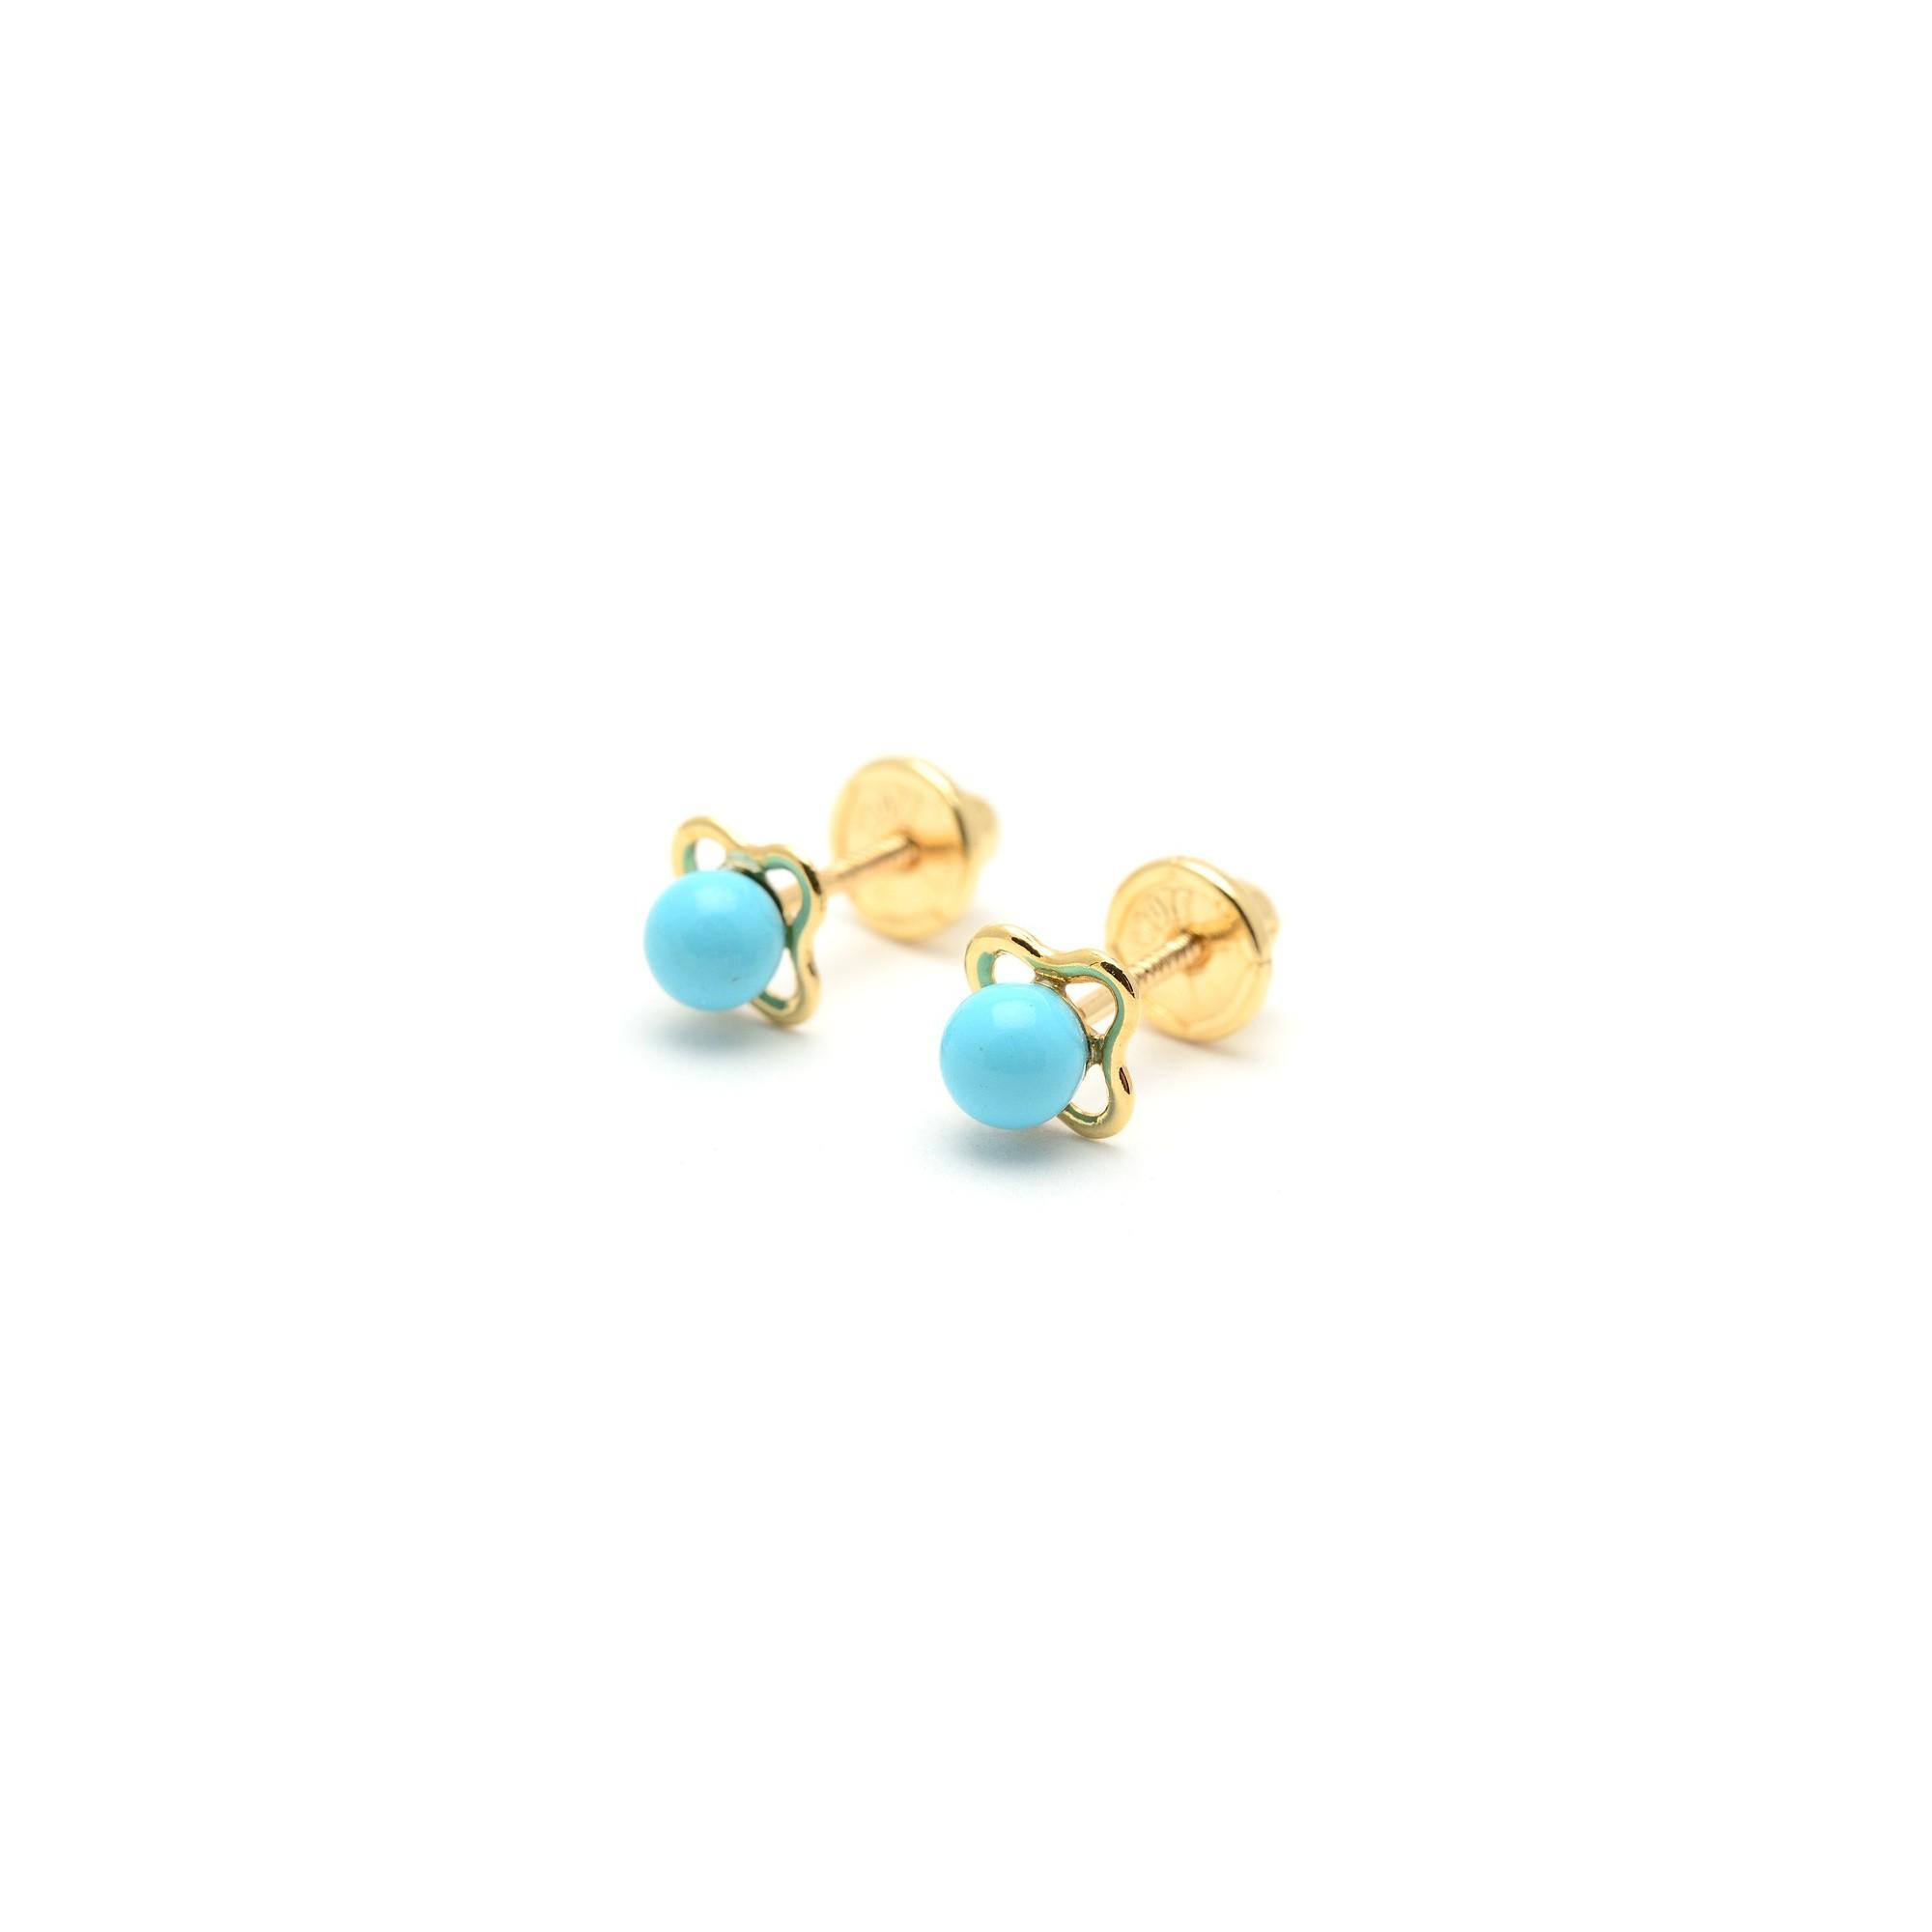 61a86dfbe2c4 Pendientes Oro Bebé Niña Infantil Flor Turquesa Azul